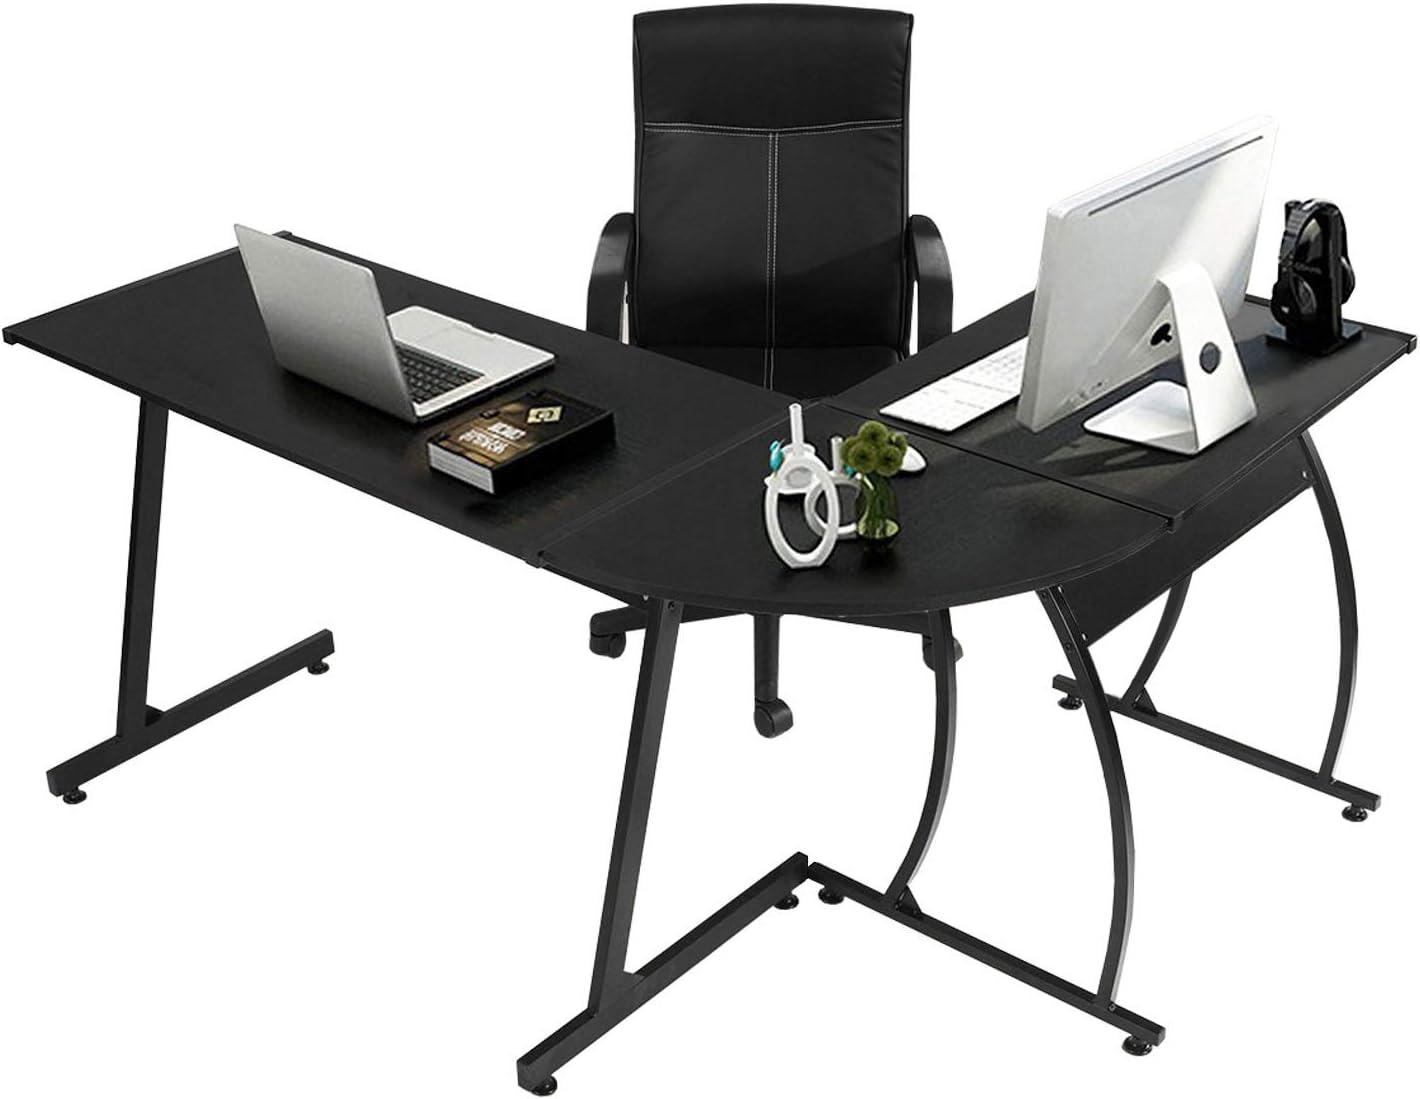 Gaming Desk for 2 Monitors